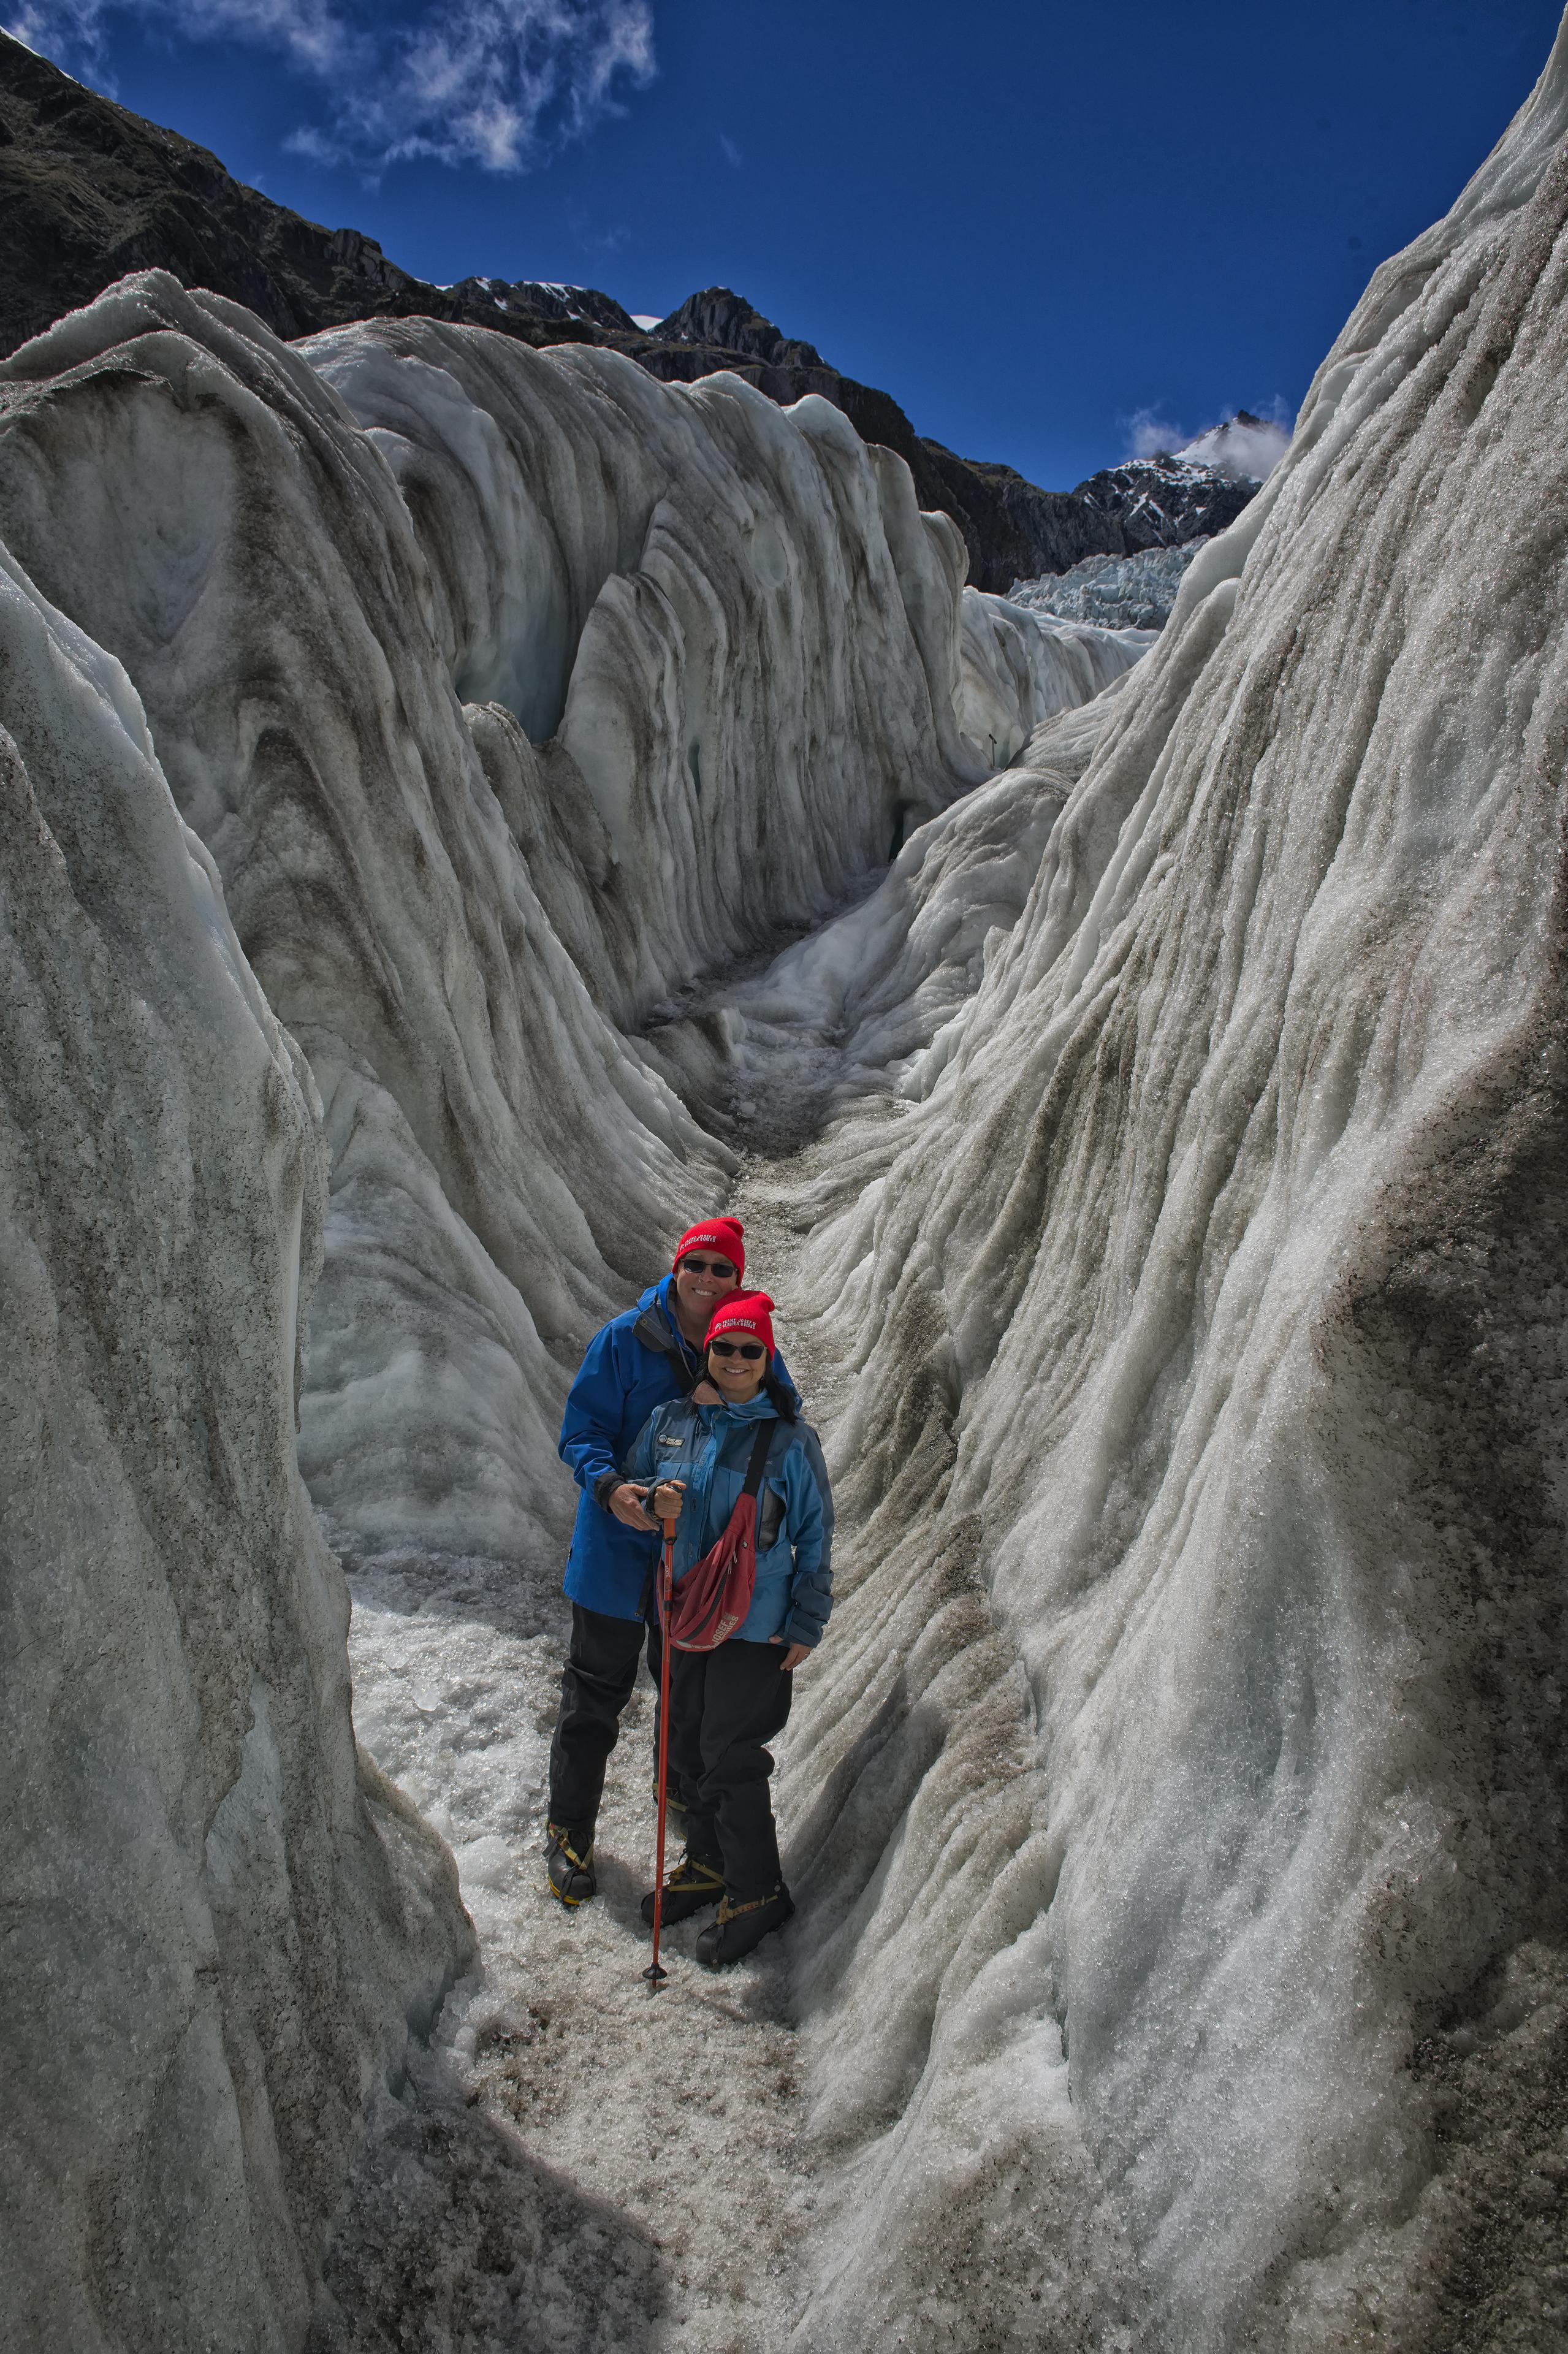 Hiking the Franz Josef Glacier